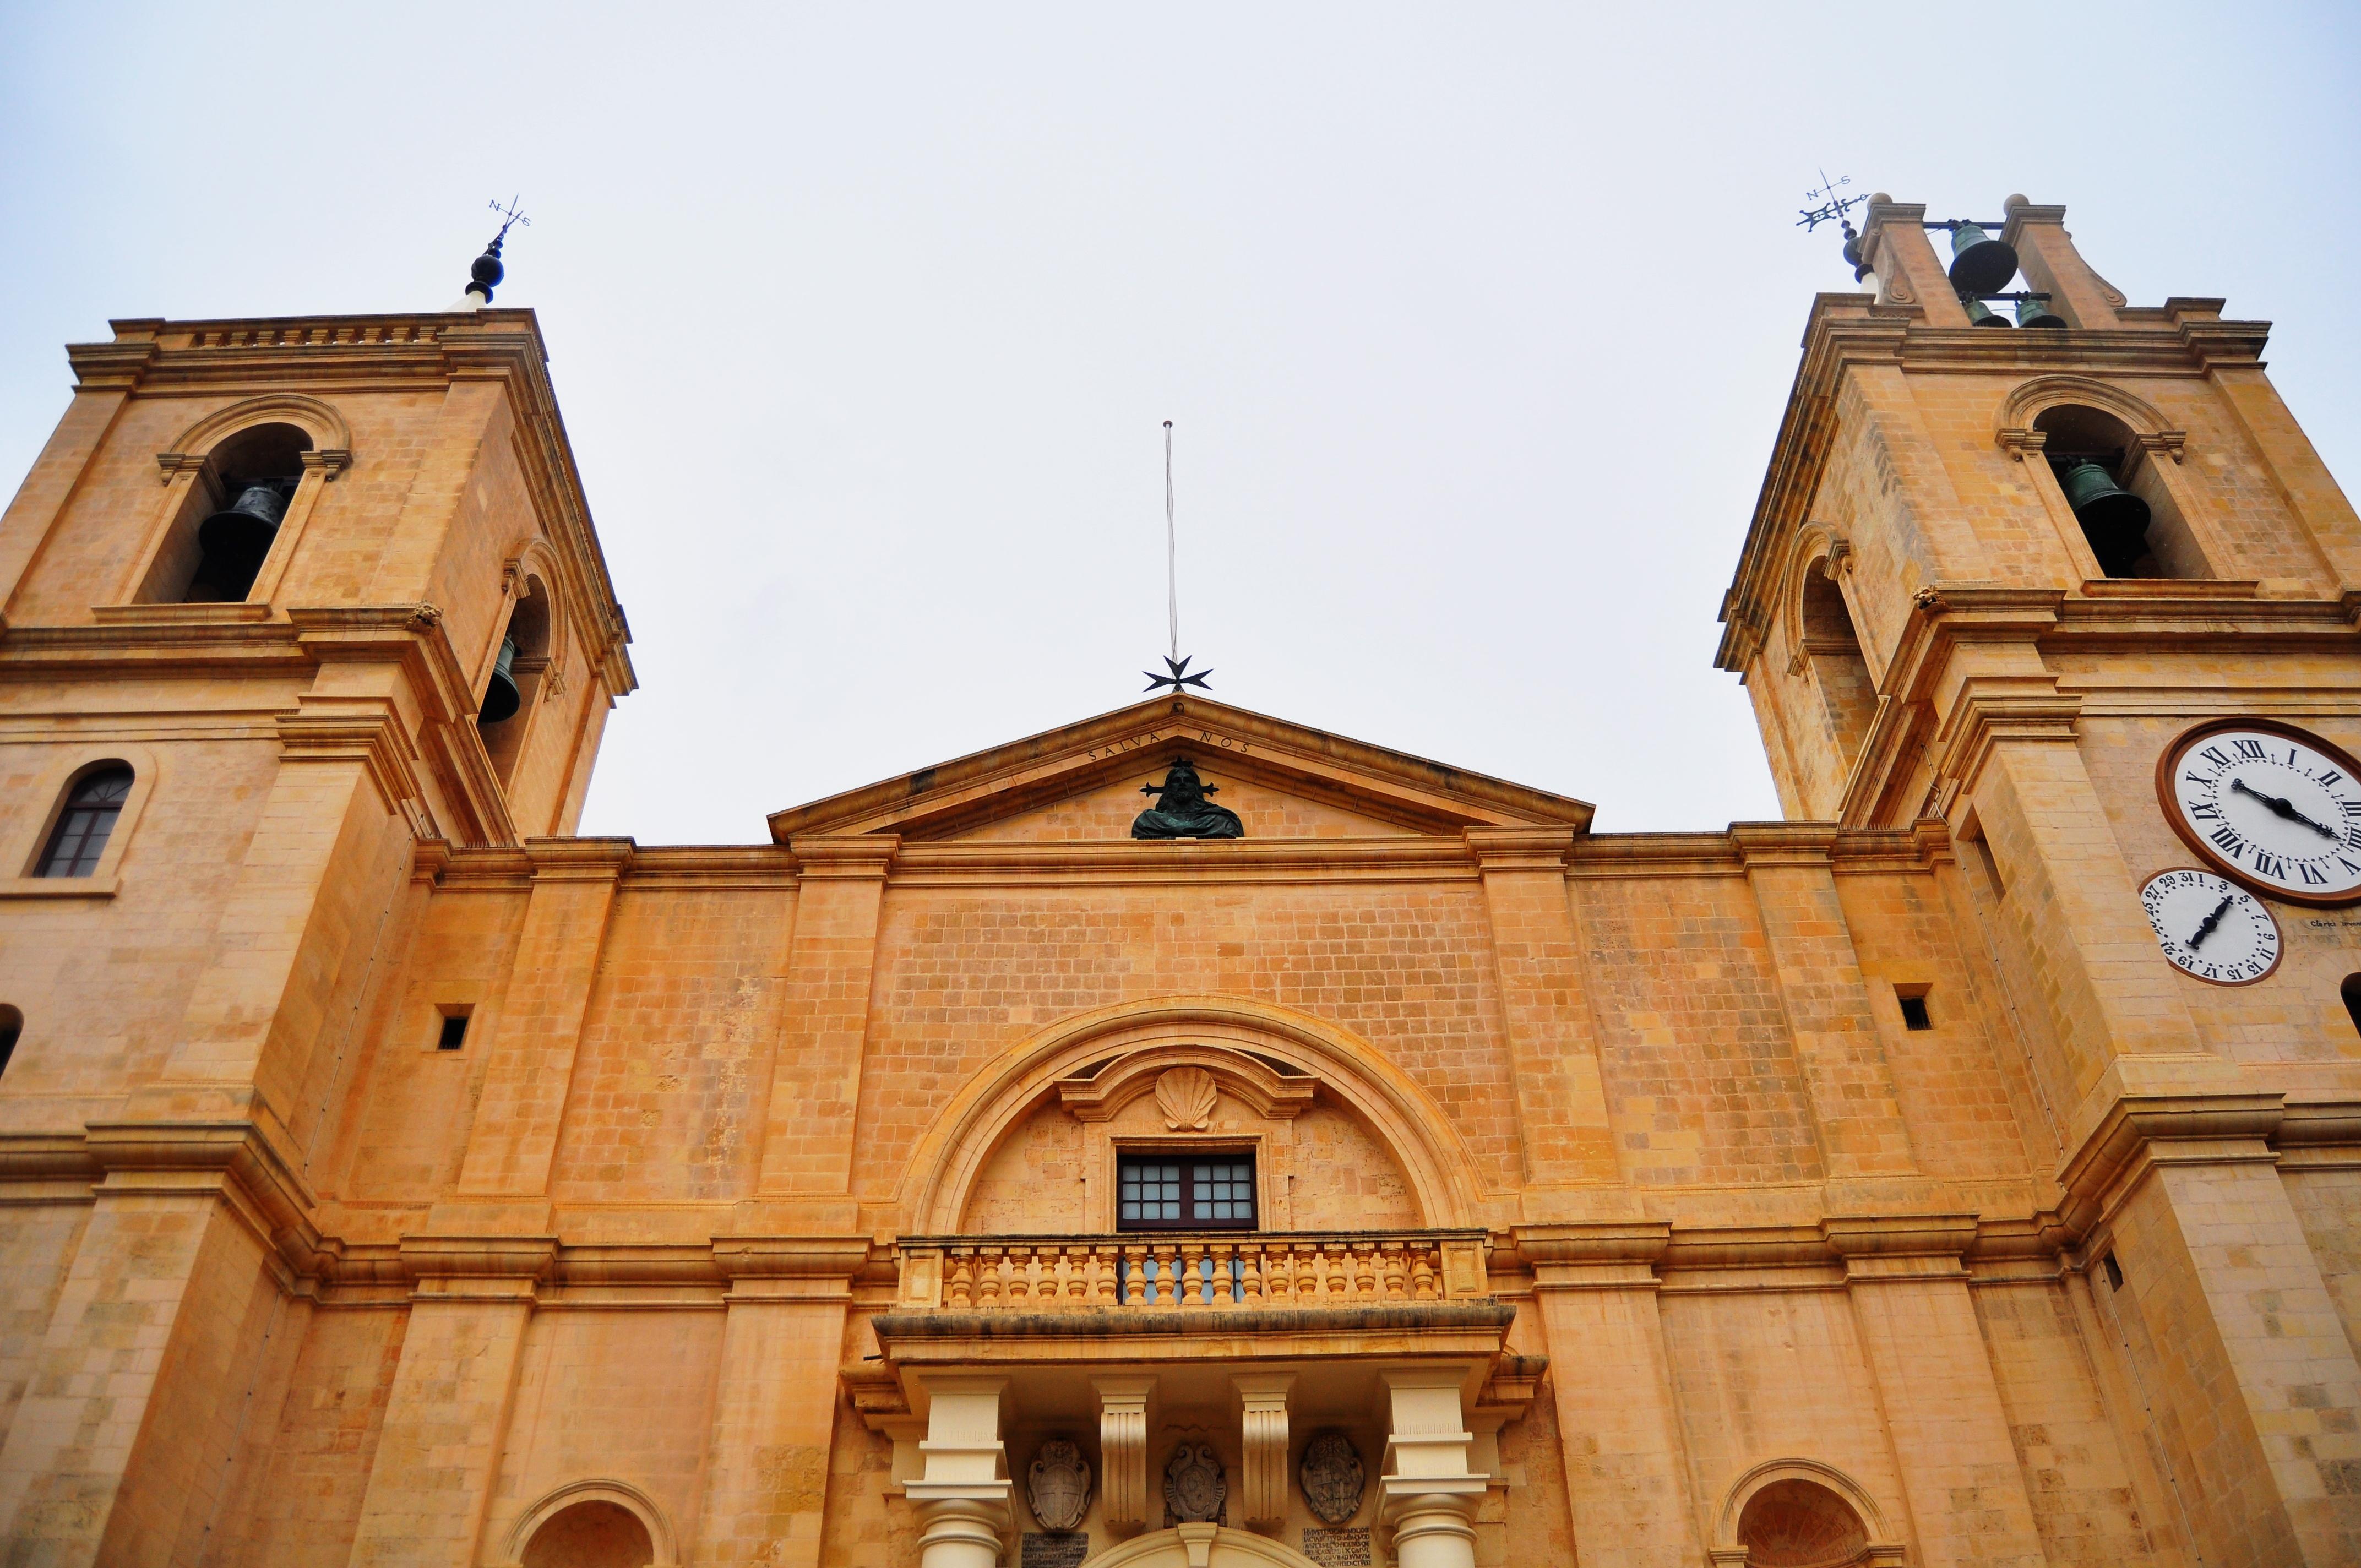 Catedrala Sf. Ioan Botezătorul (St John Co-Cathedral). Malta